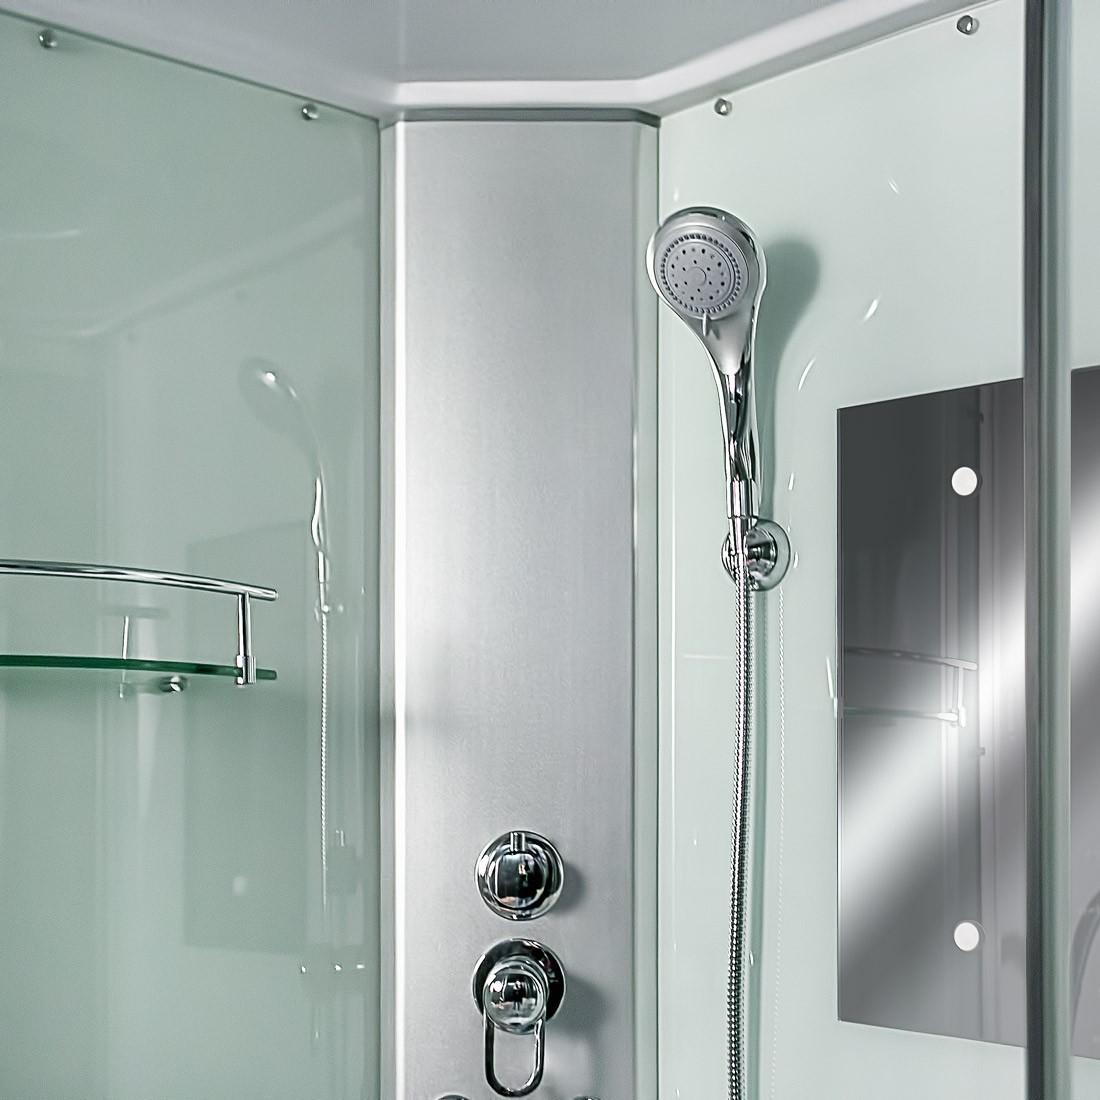 acquavapore dtp10 1000 duschkabine fertigdusche dusche komplettkabine m90 ebay. Black Bedroom Furniture Sets. Home Design Ideas